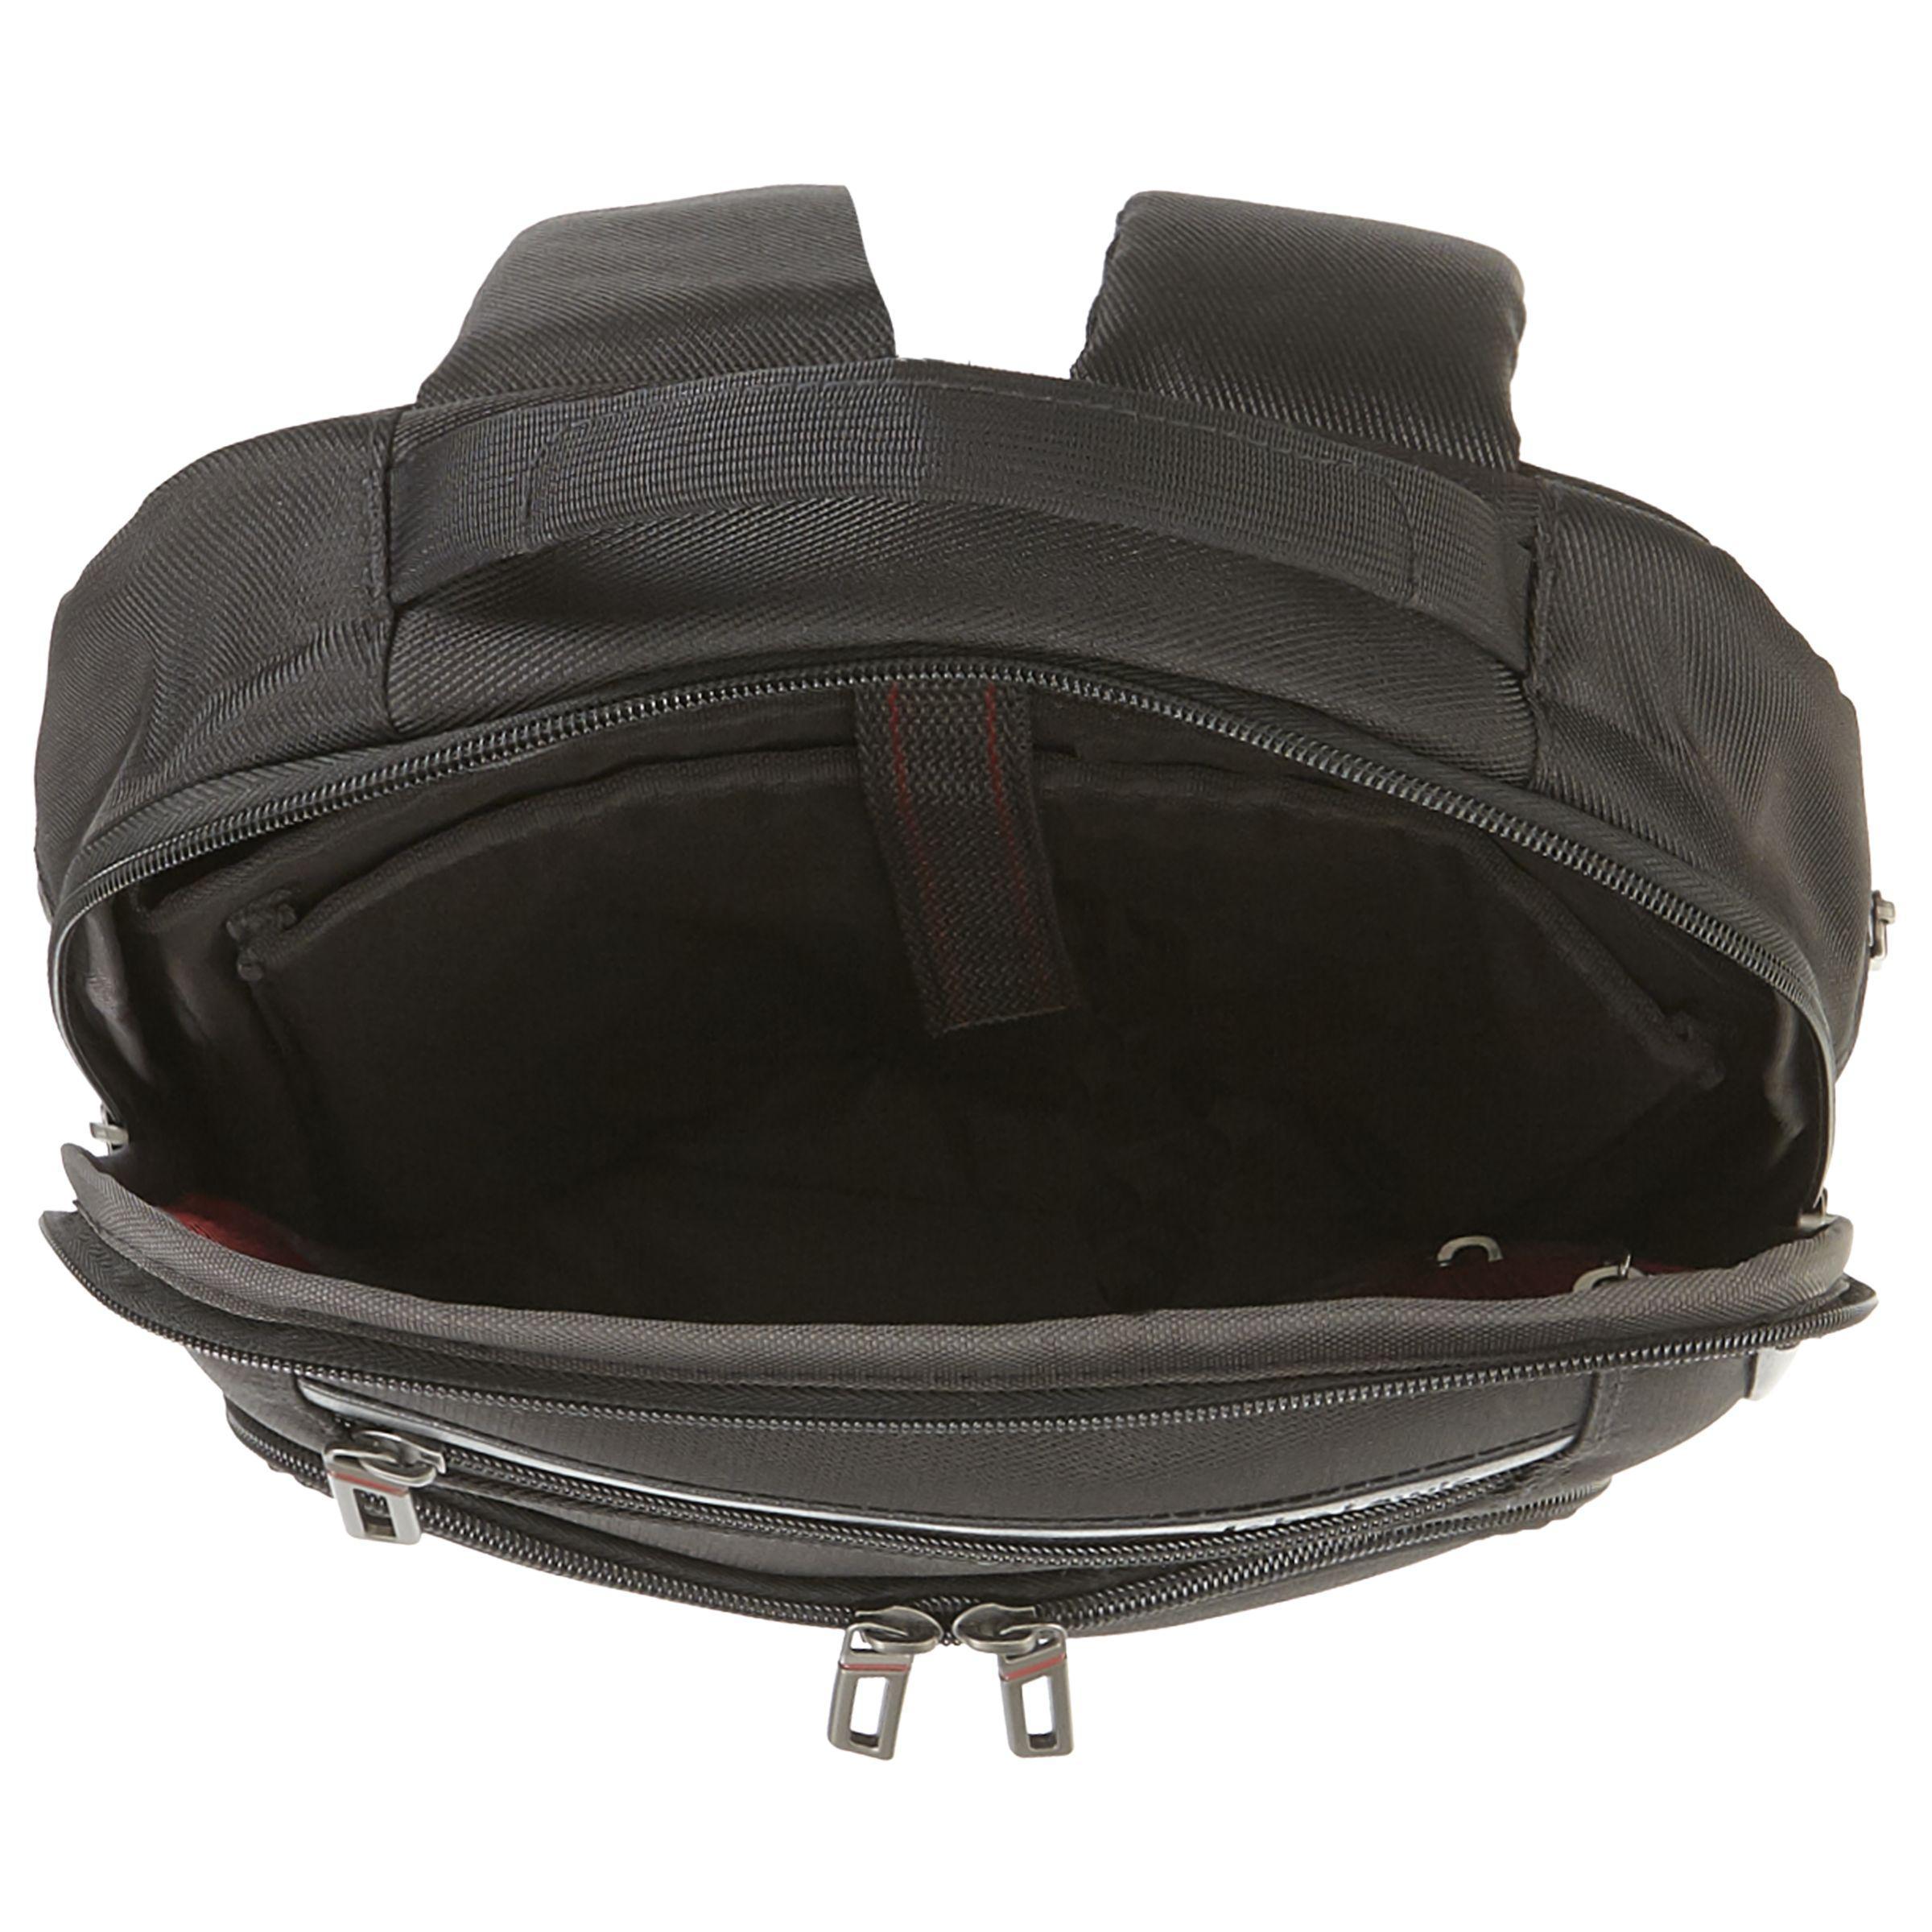 "John Lewis Synthetic Raise Expanding 15"" Laptop Backpack in Black for Men"